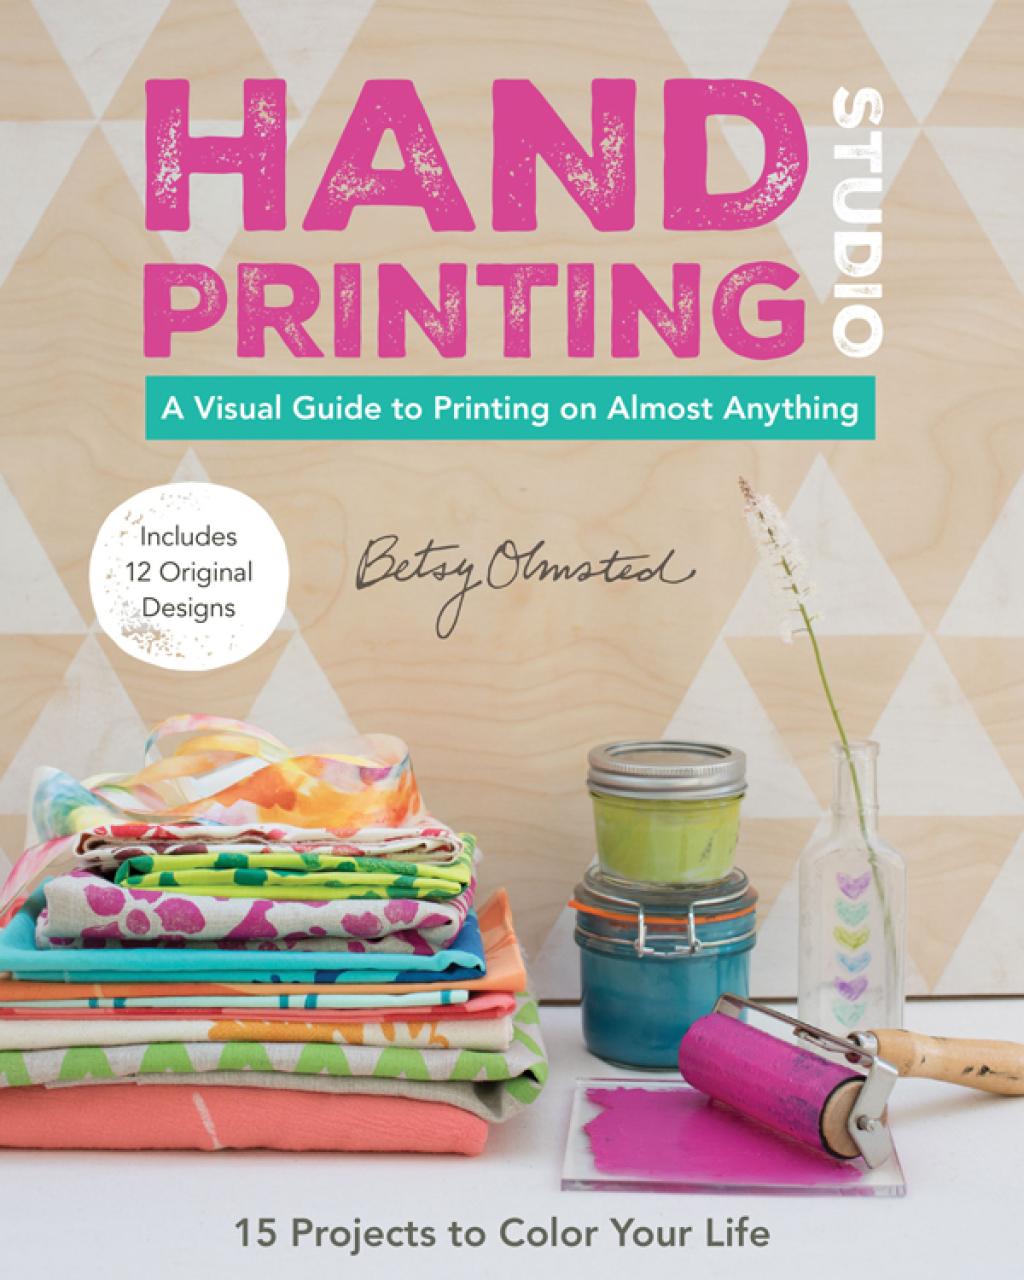 Hand-Printing Studio (eBook) (9781617451485) photo